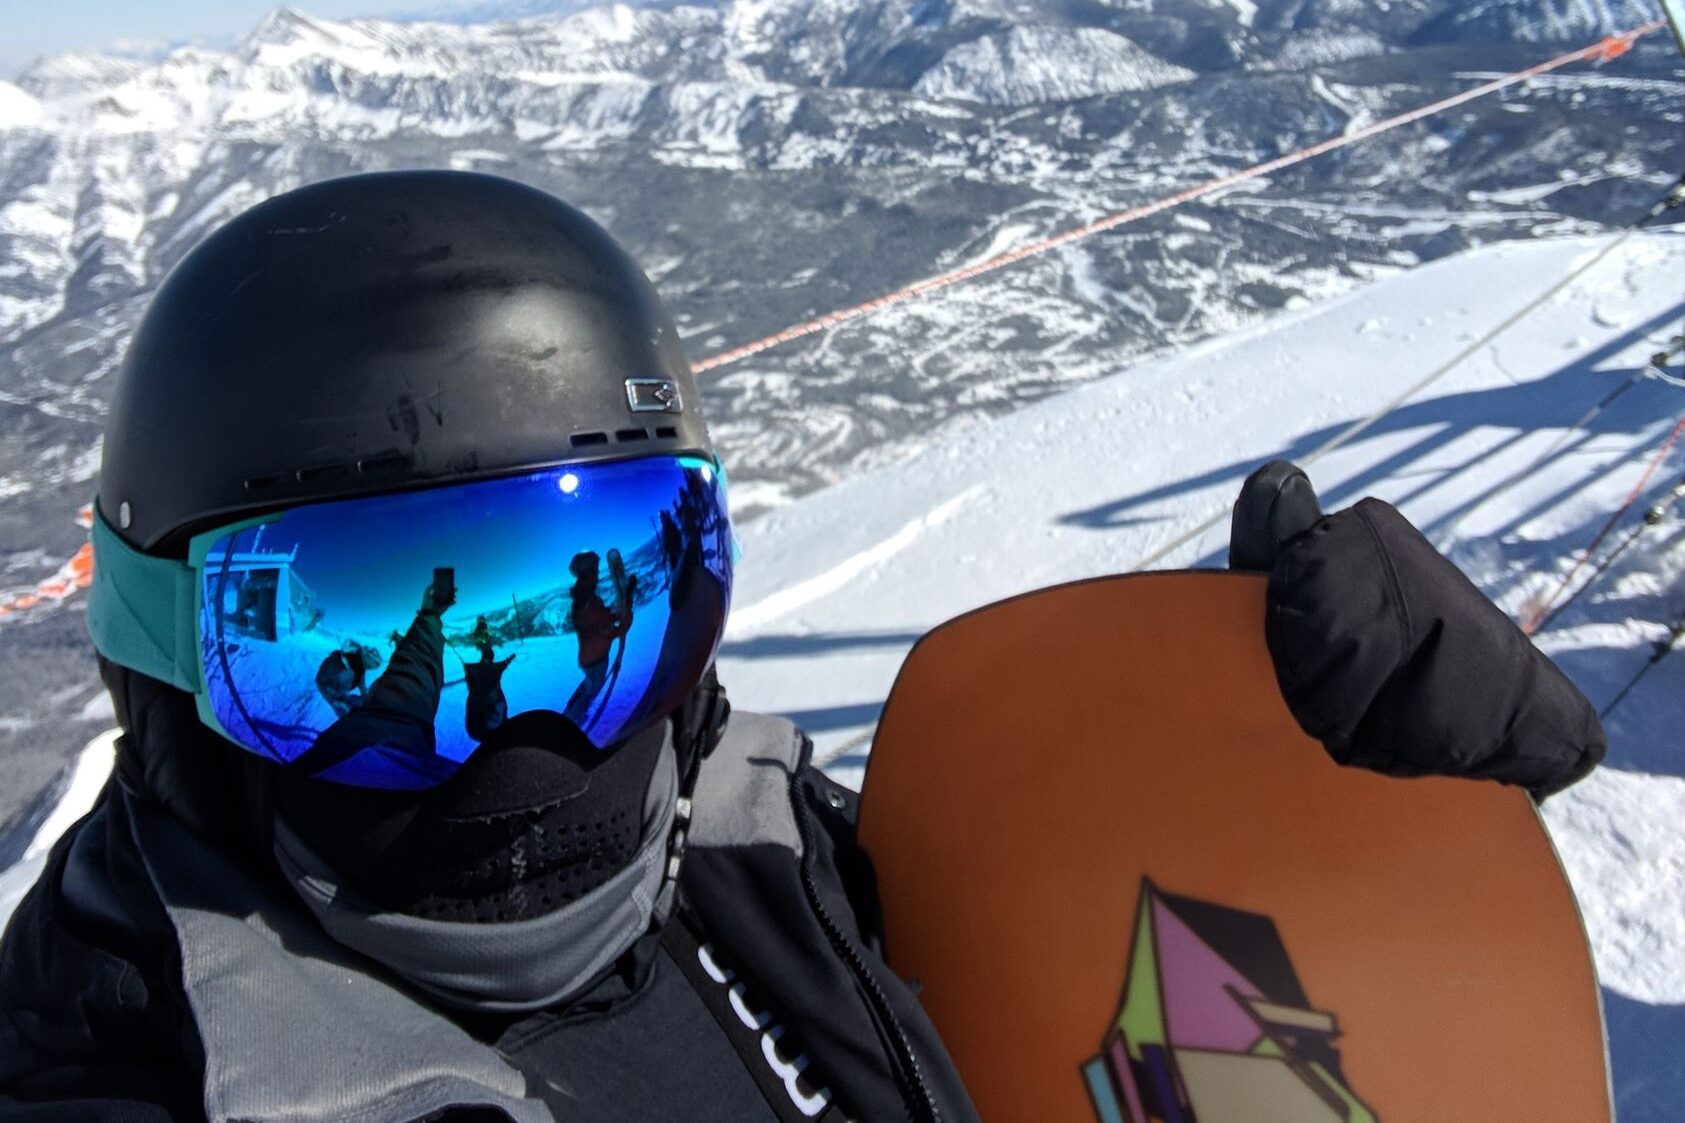 snowboarding-ben+muell.jpg